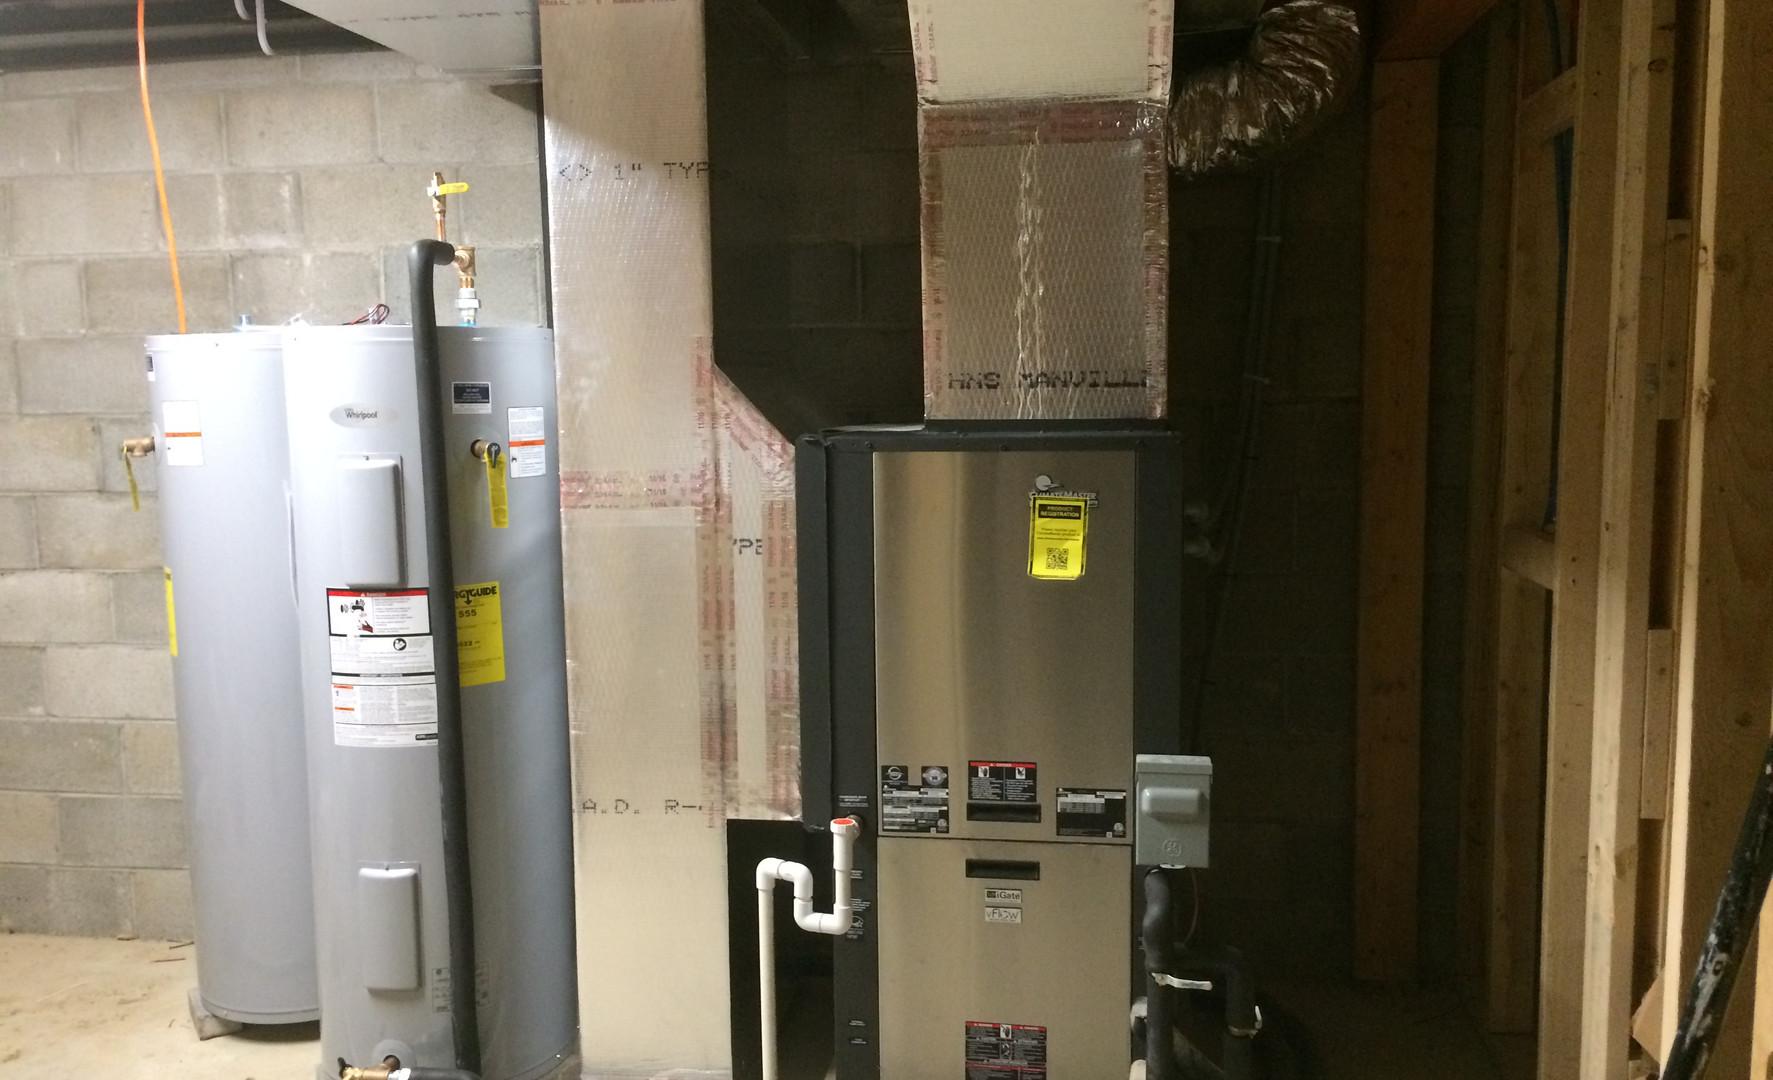 ClimateMaster geothermal installation